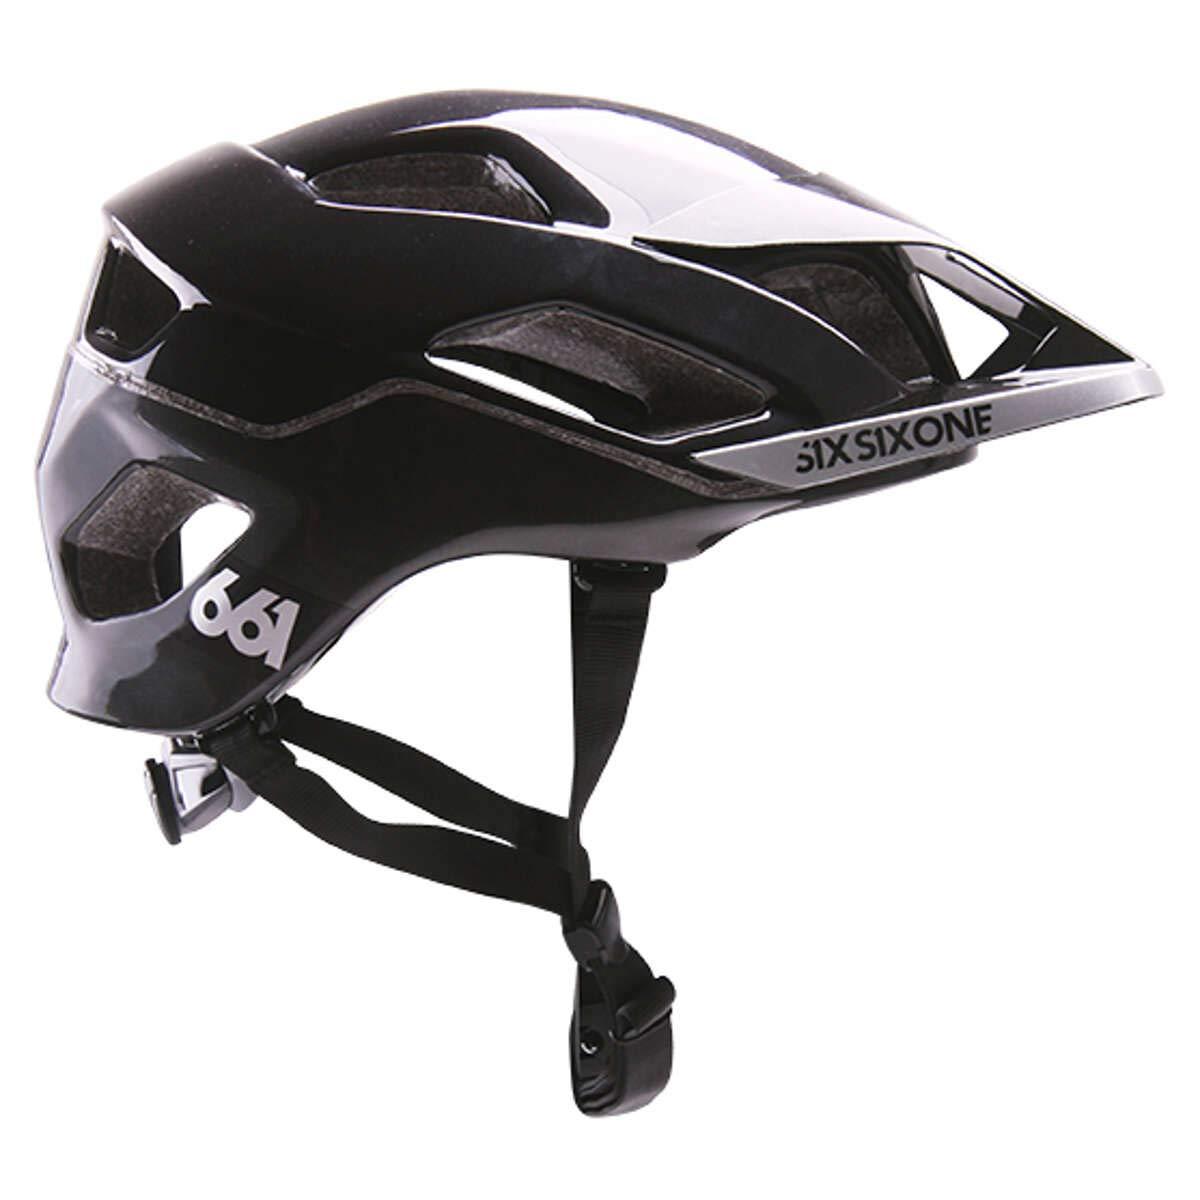 SixSixOne Enduro-MTB Helm Evo AM MIPS Schwarz Gr. XS/S